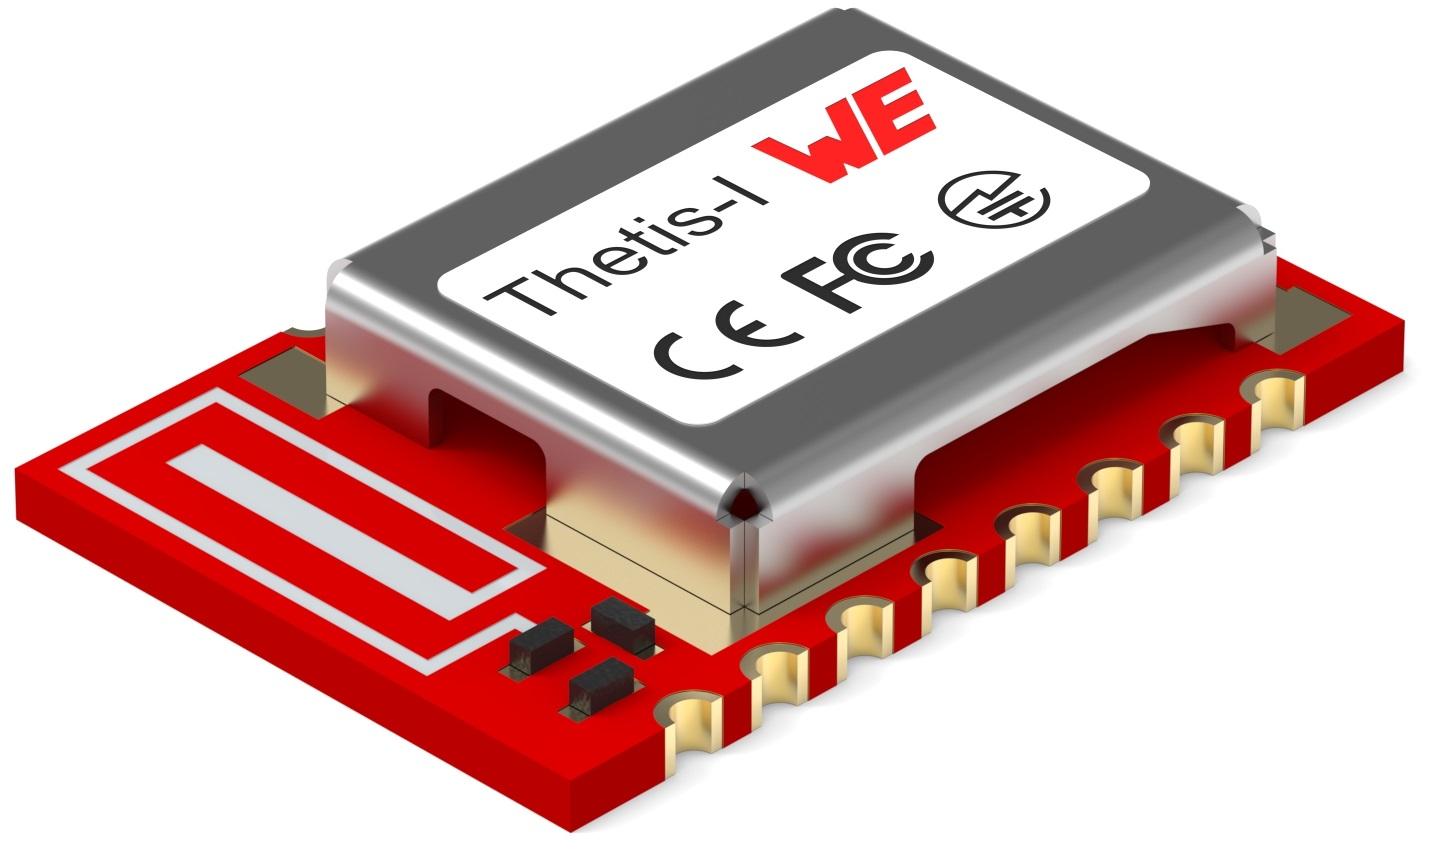 Würth Elektronik Thetis-I (Radio Module Wirepas IoT Netwerk)